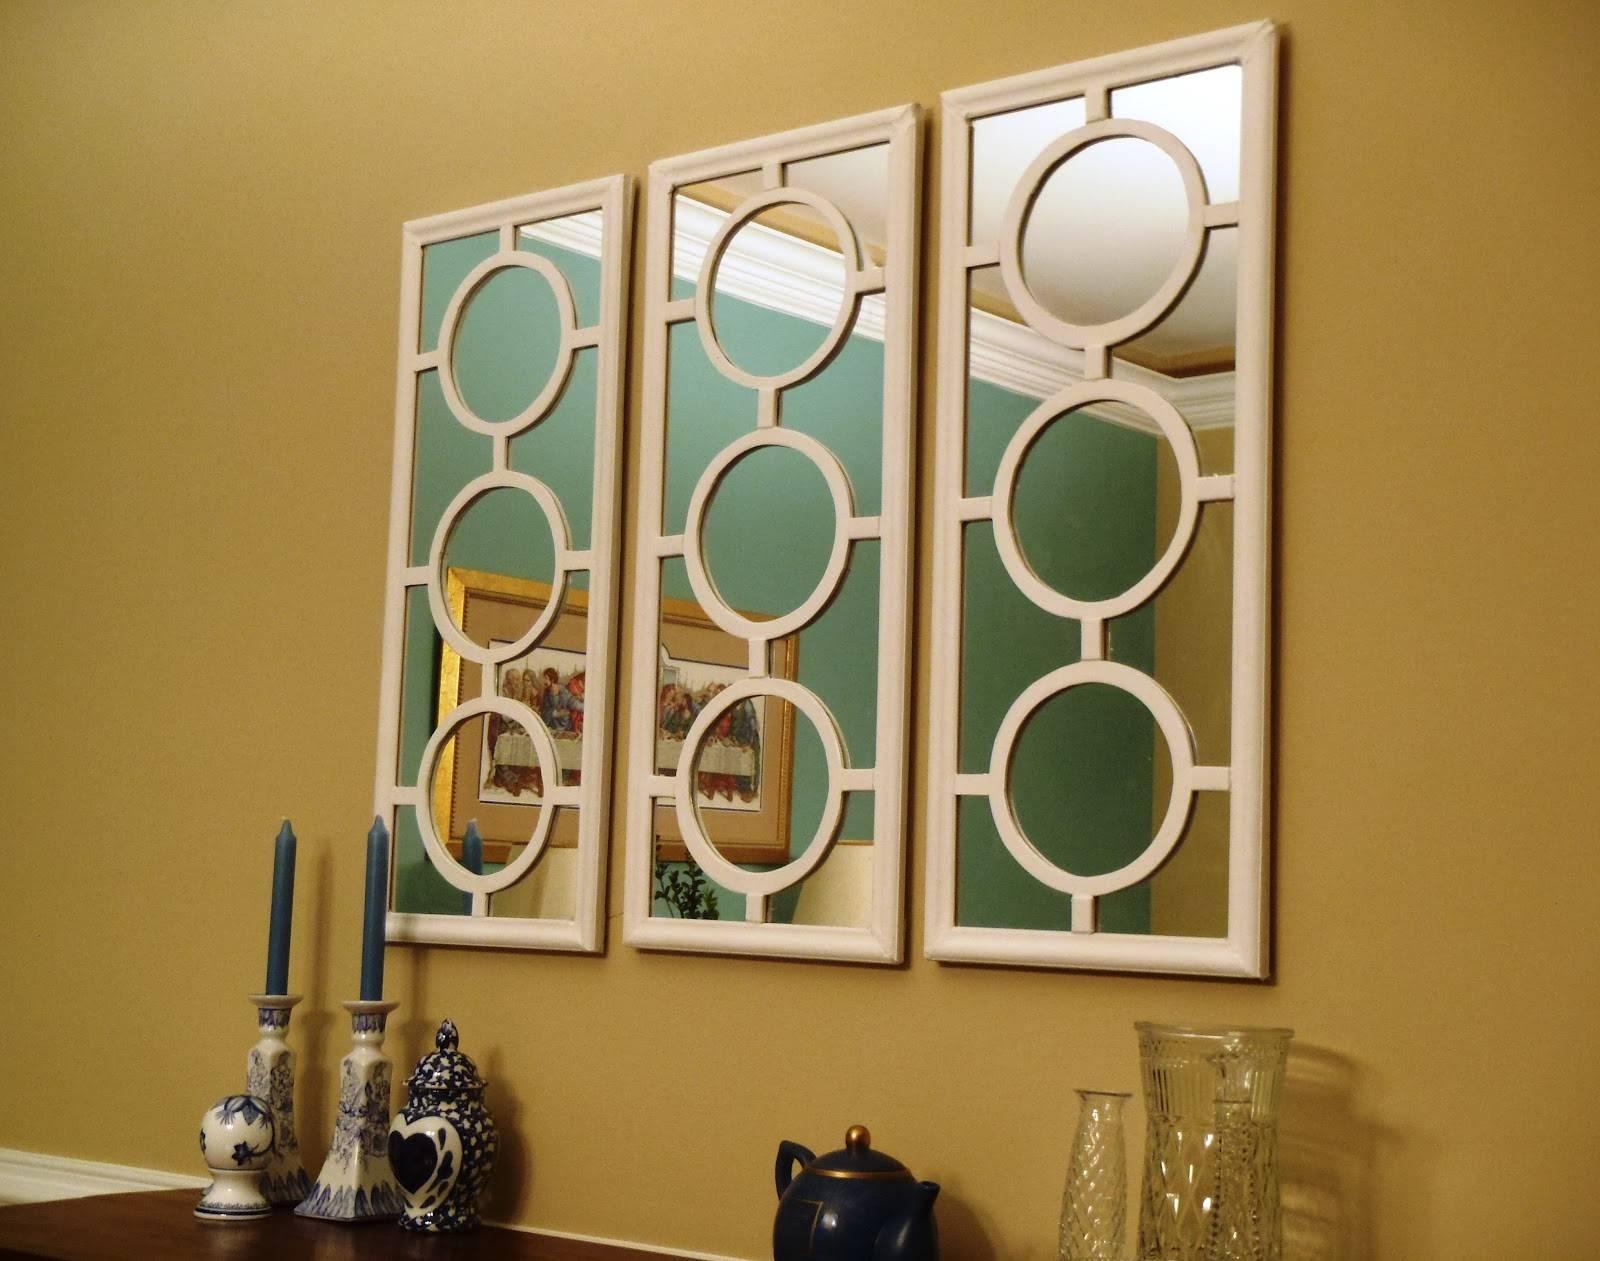 Bedroom : Extraordinary Wall Mirror Art Mirror Bathroom Mirror Within Most Recent Mirror Circles Wall Art (View 14 of 20)